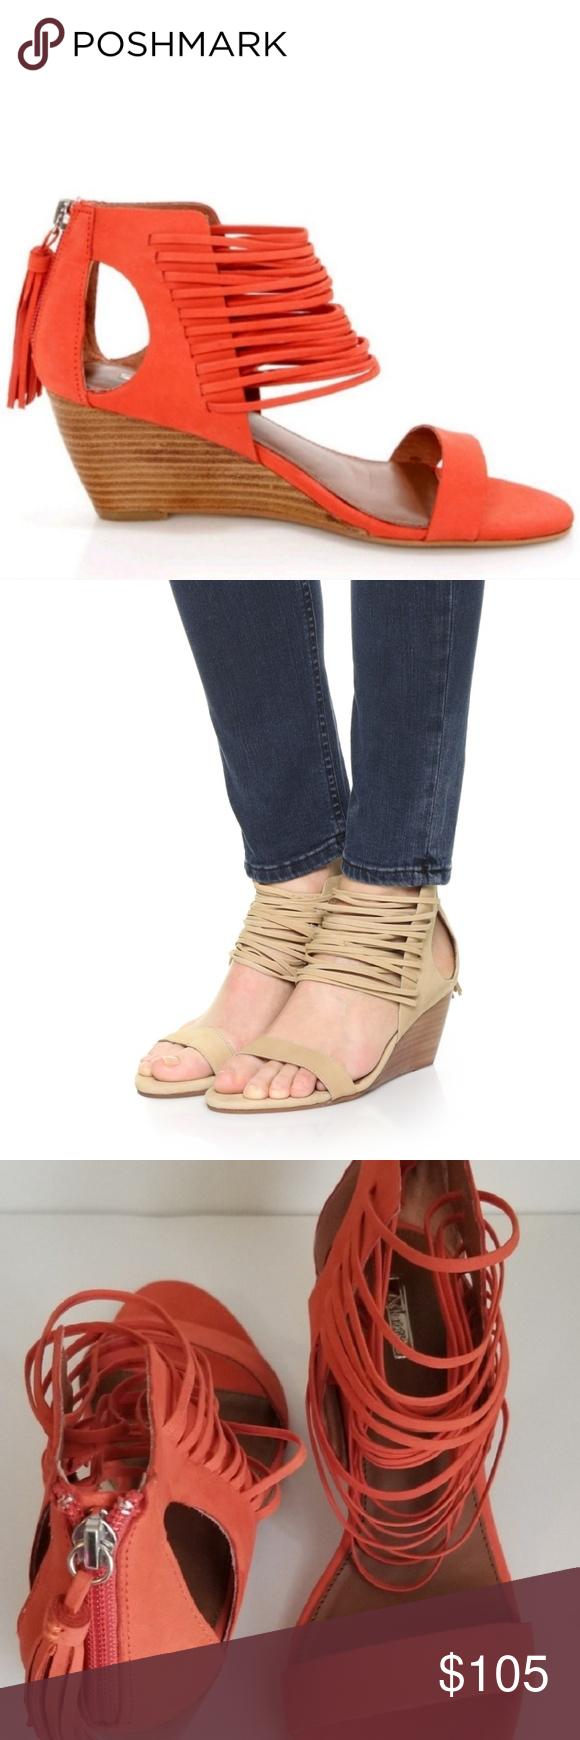 9738d48511c Matiko Bryn II Papaya Strappy Ankle Cuff Wedge For Lulu s